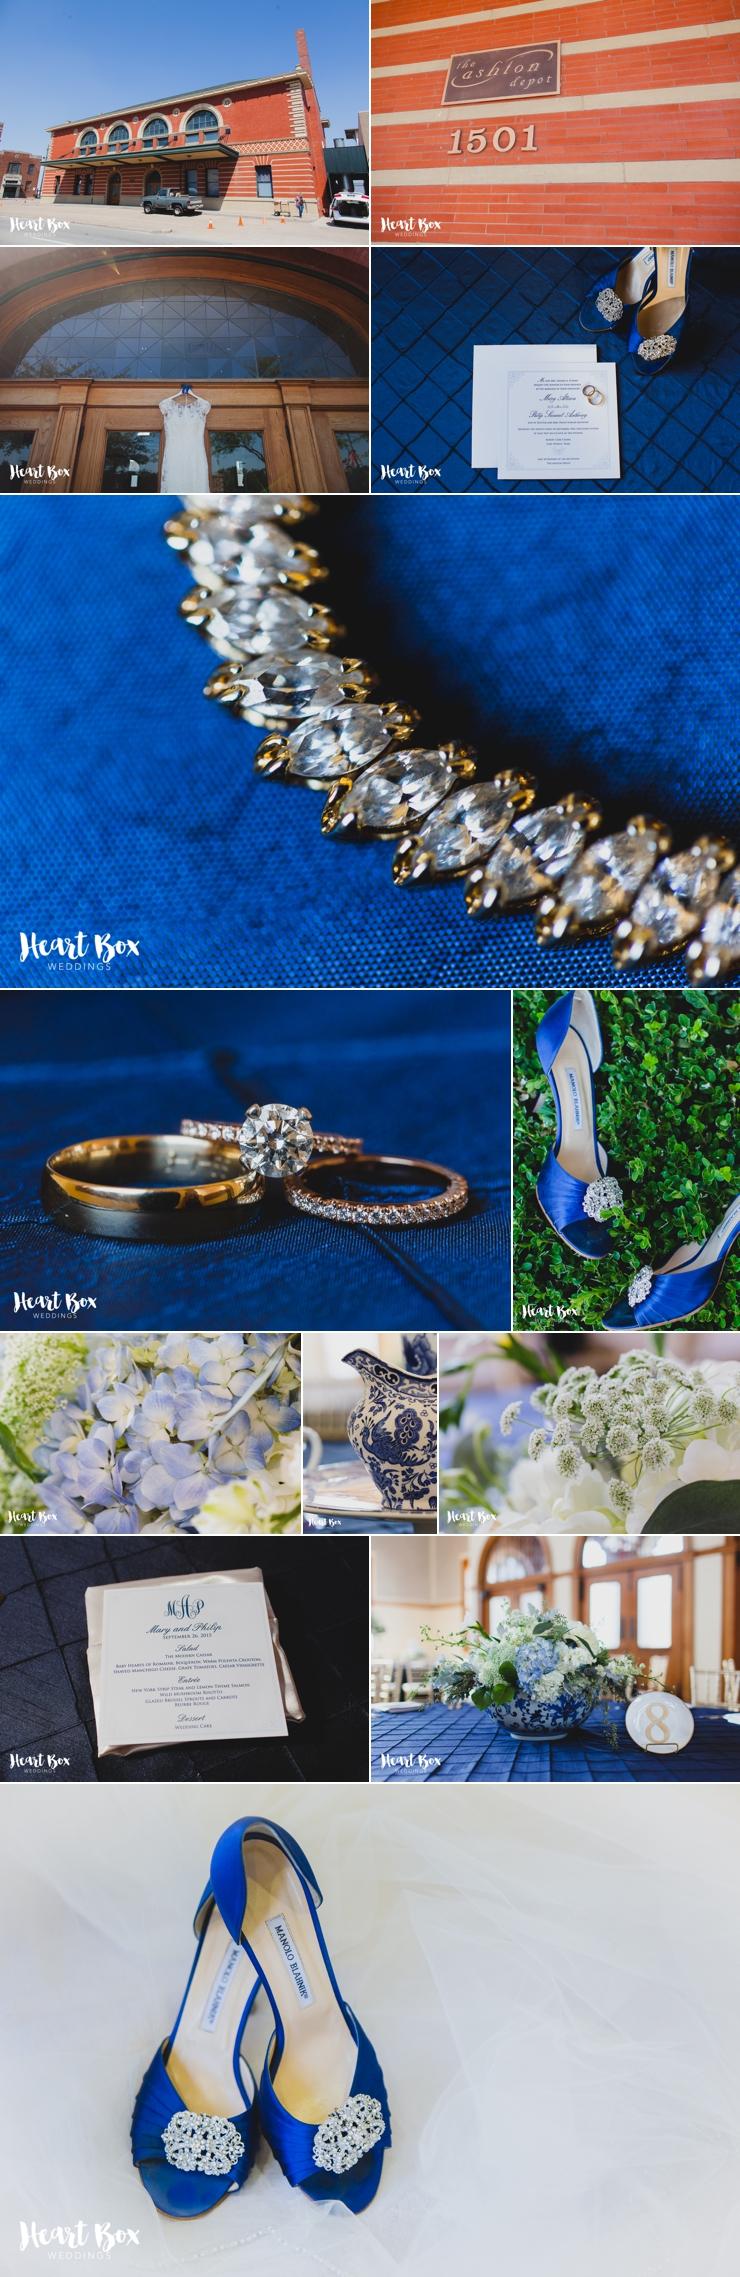 Anthony Wedding Blog Collages 1.jpg